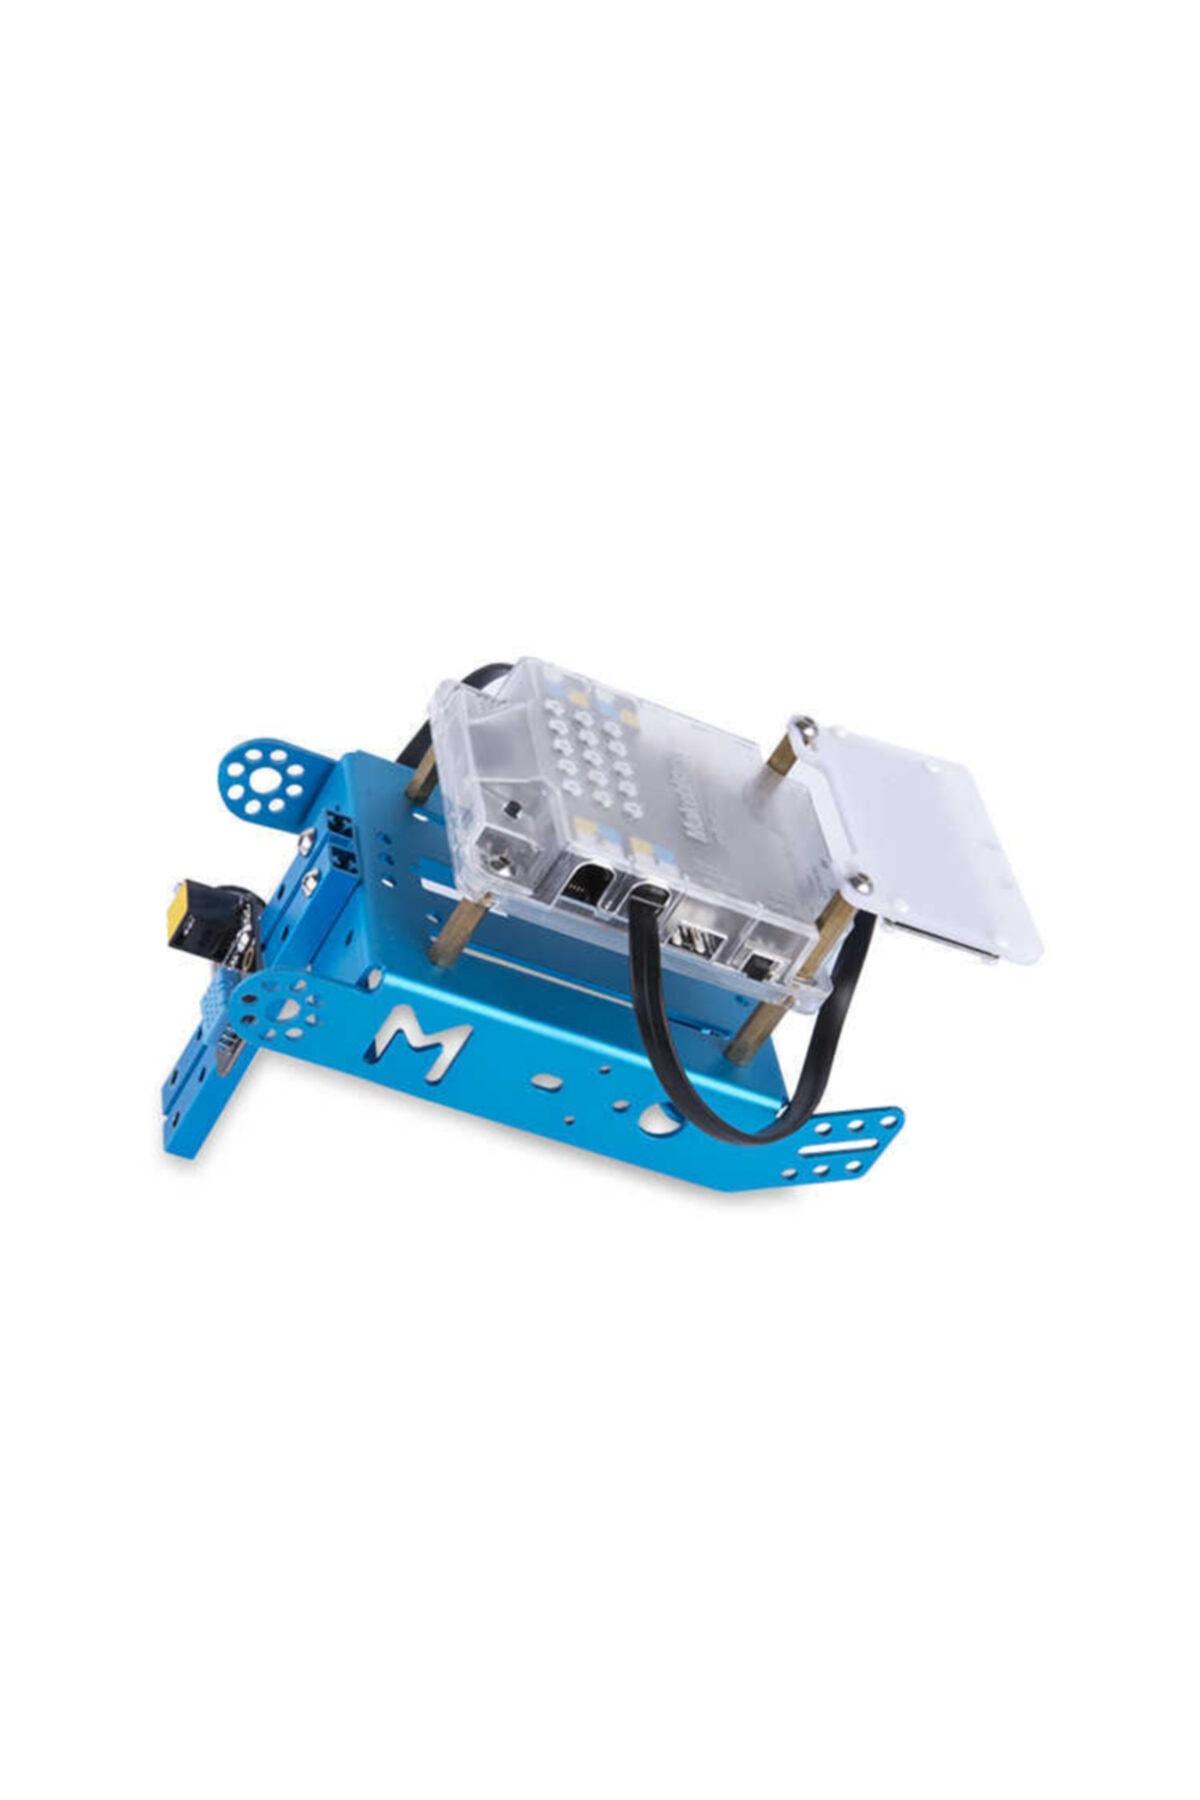 MakeBlock Mbot Ve Mbot Ranger Için Perception Gizmos Eklenti Paketi 2